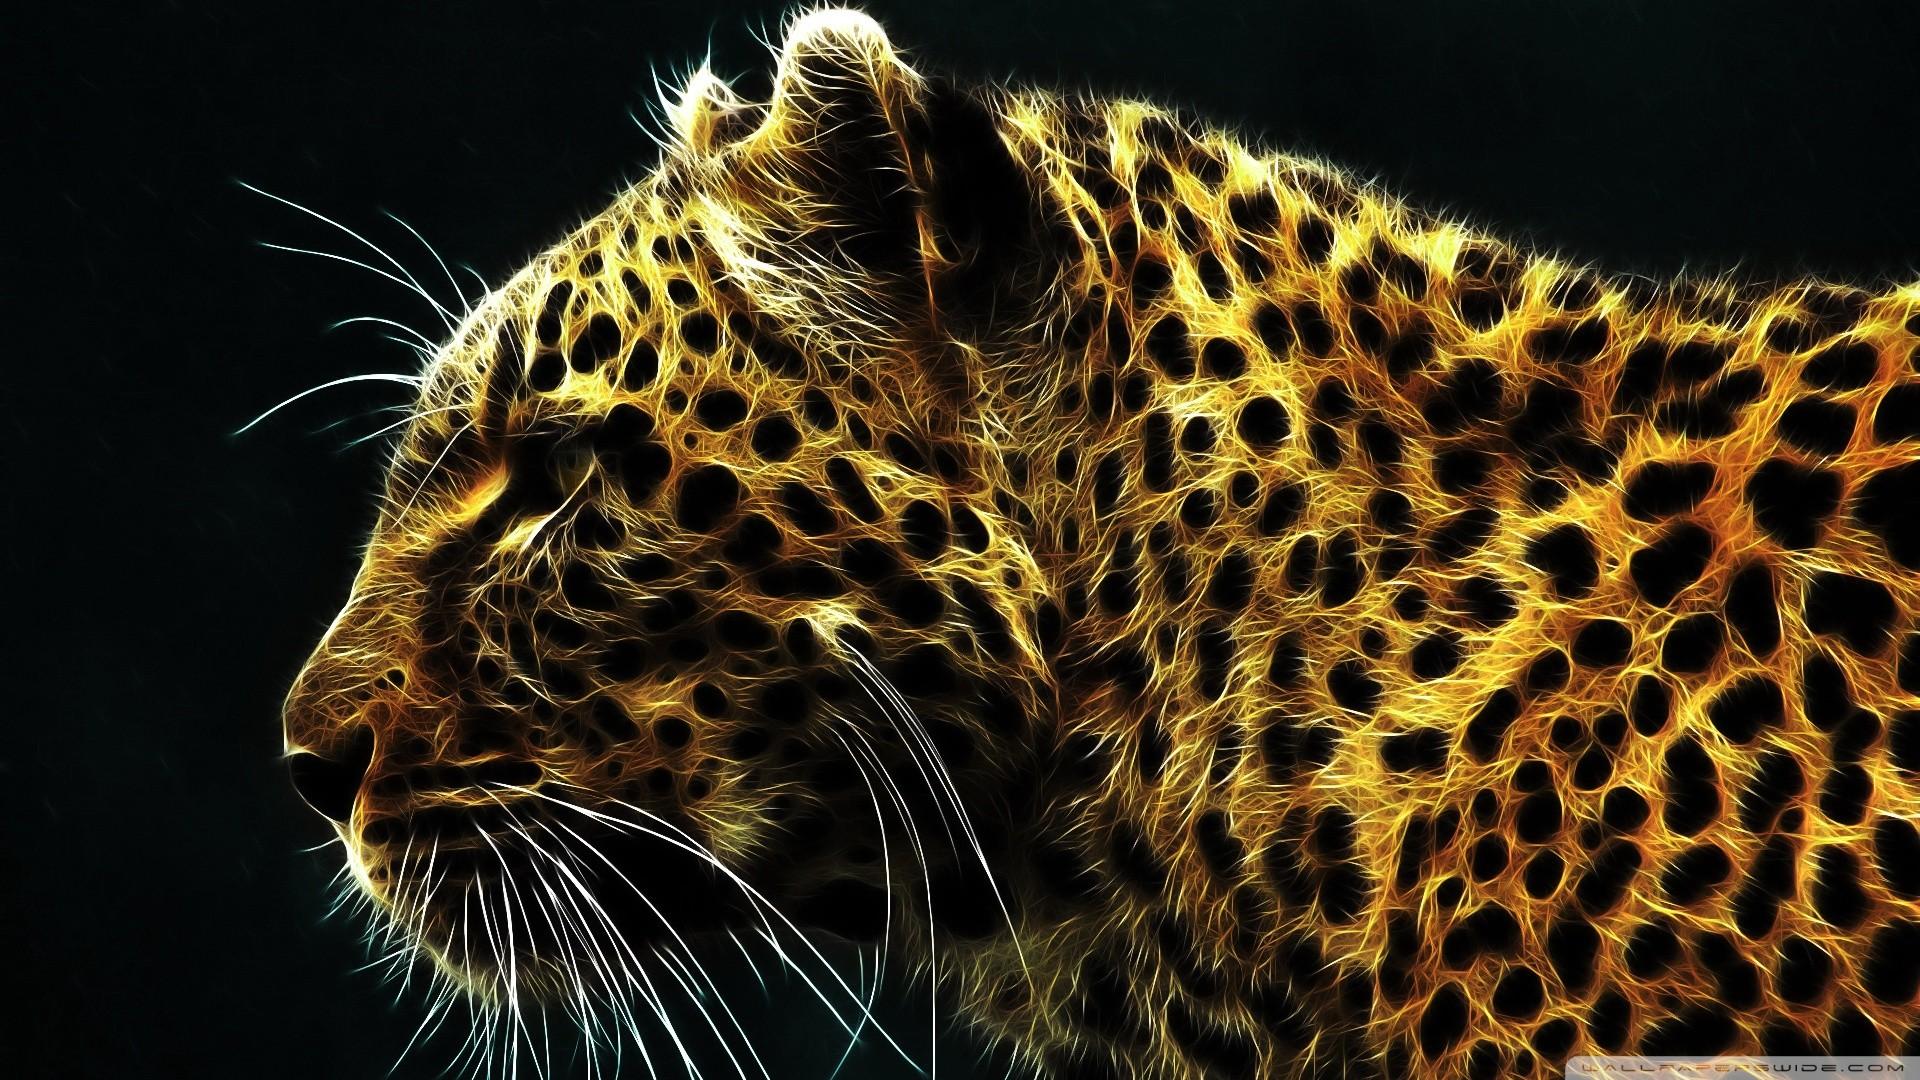 Cheetah Wallpaper HD ·â'